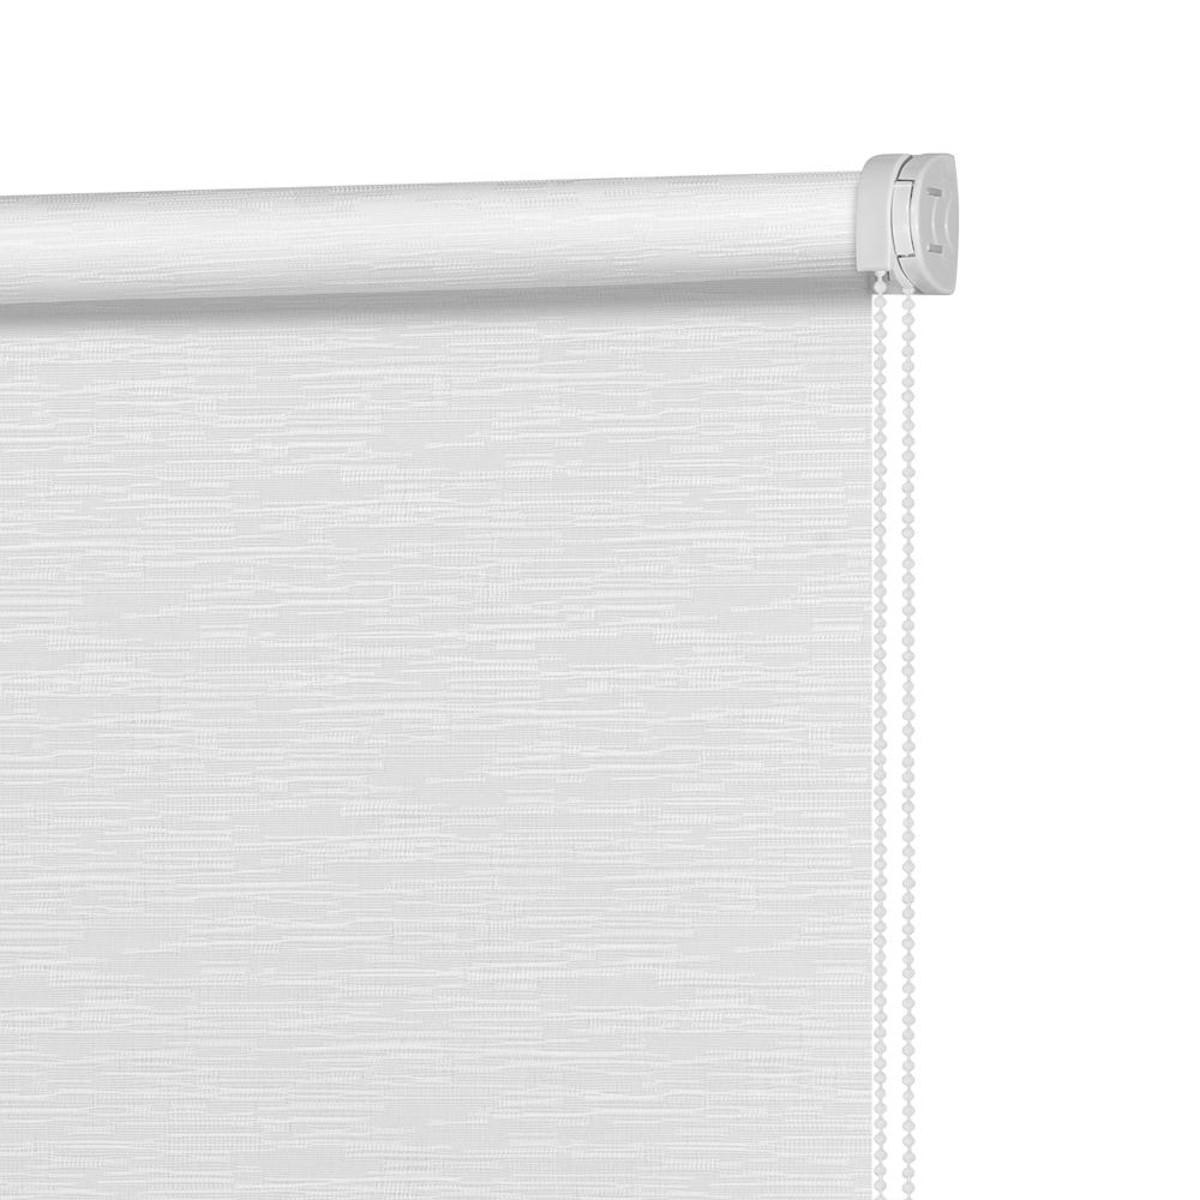 Рулонная Ора Decofest Эко 120Х160 Цвет Белый